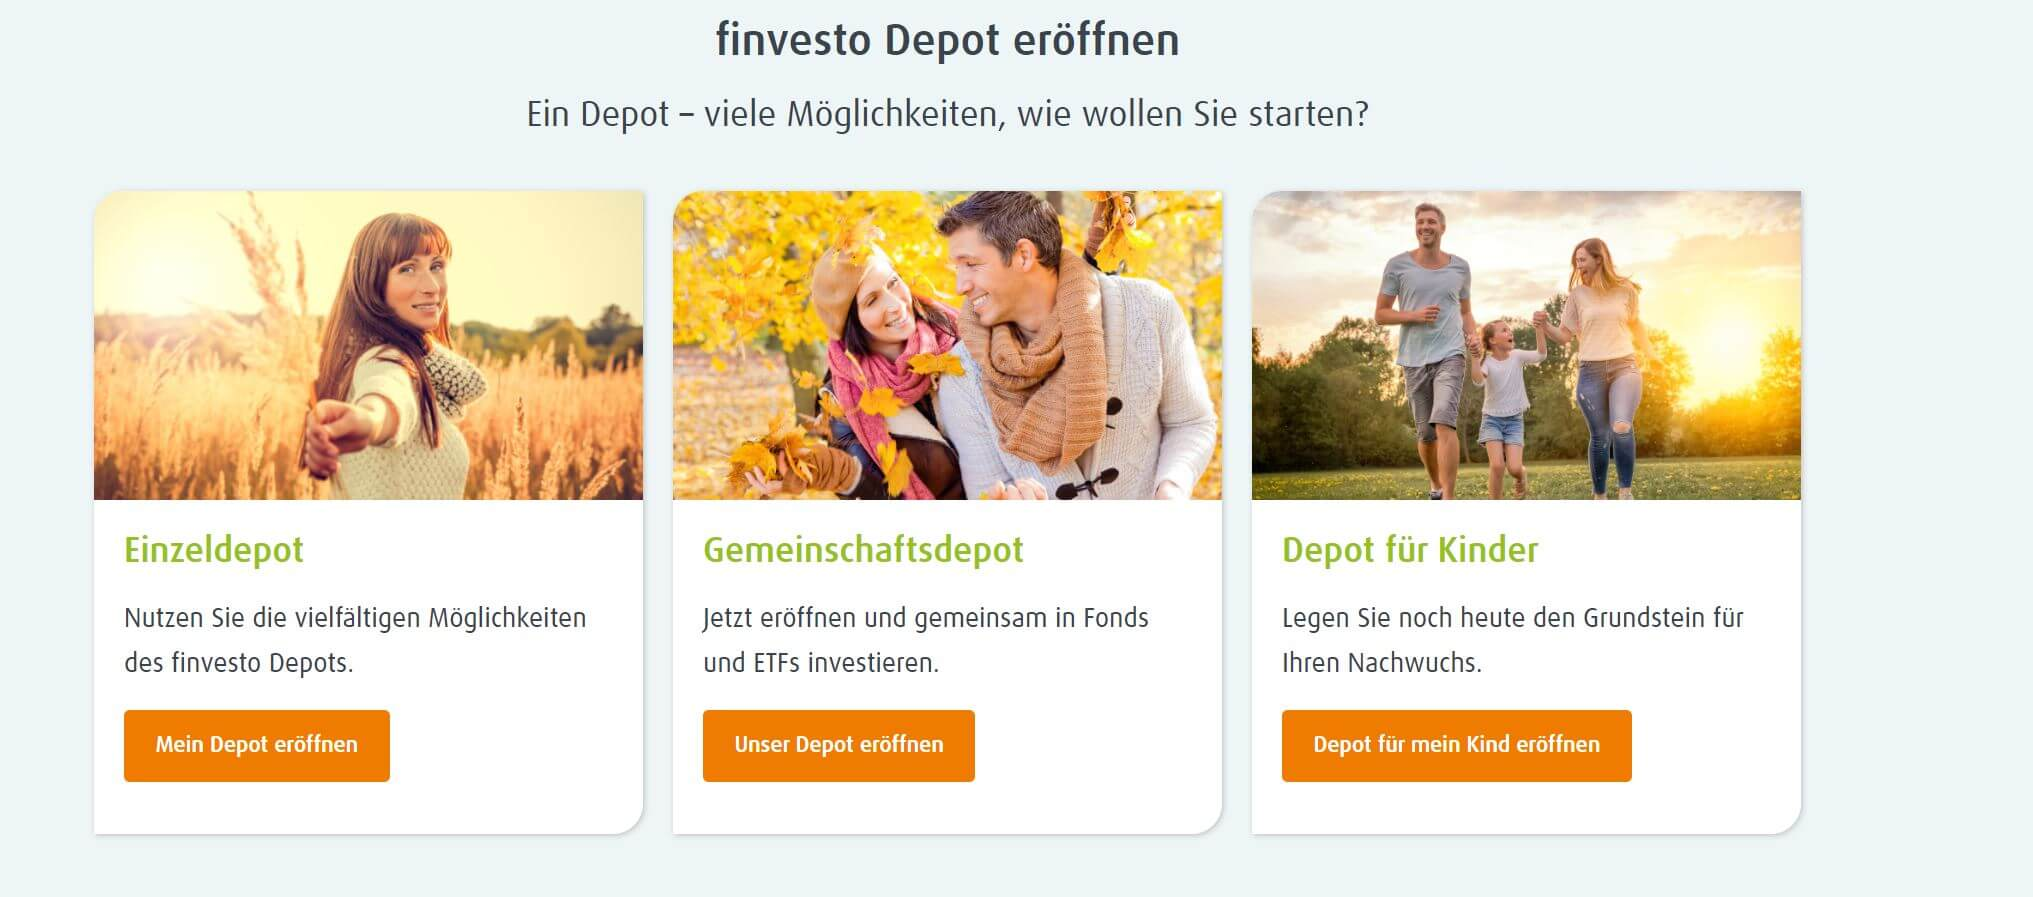 Finvesto Depot wählen